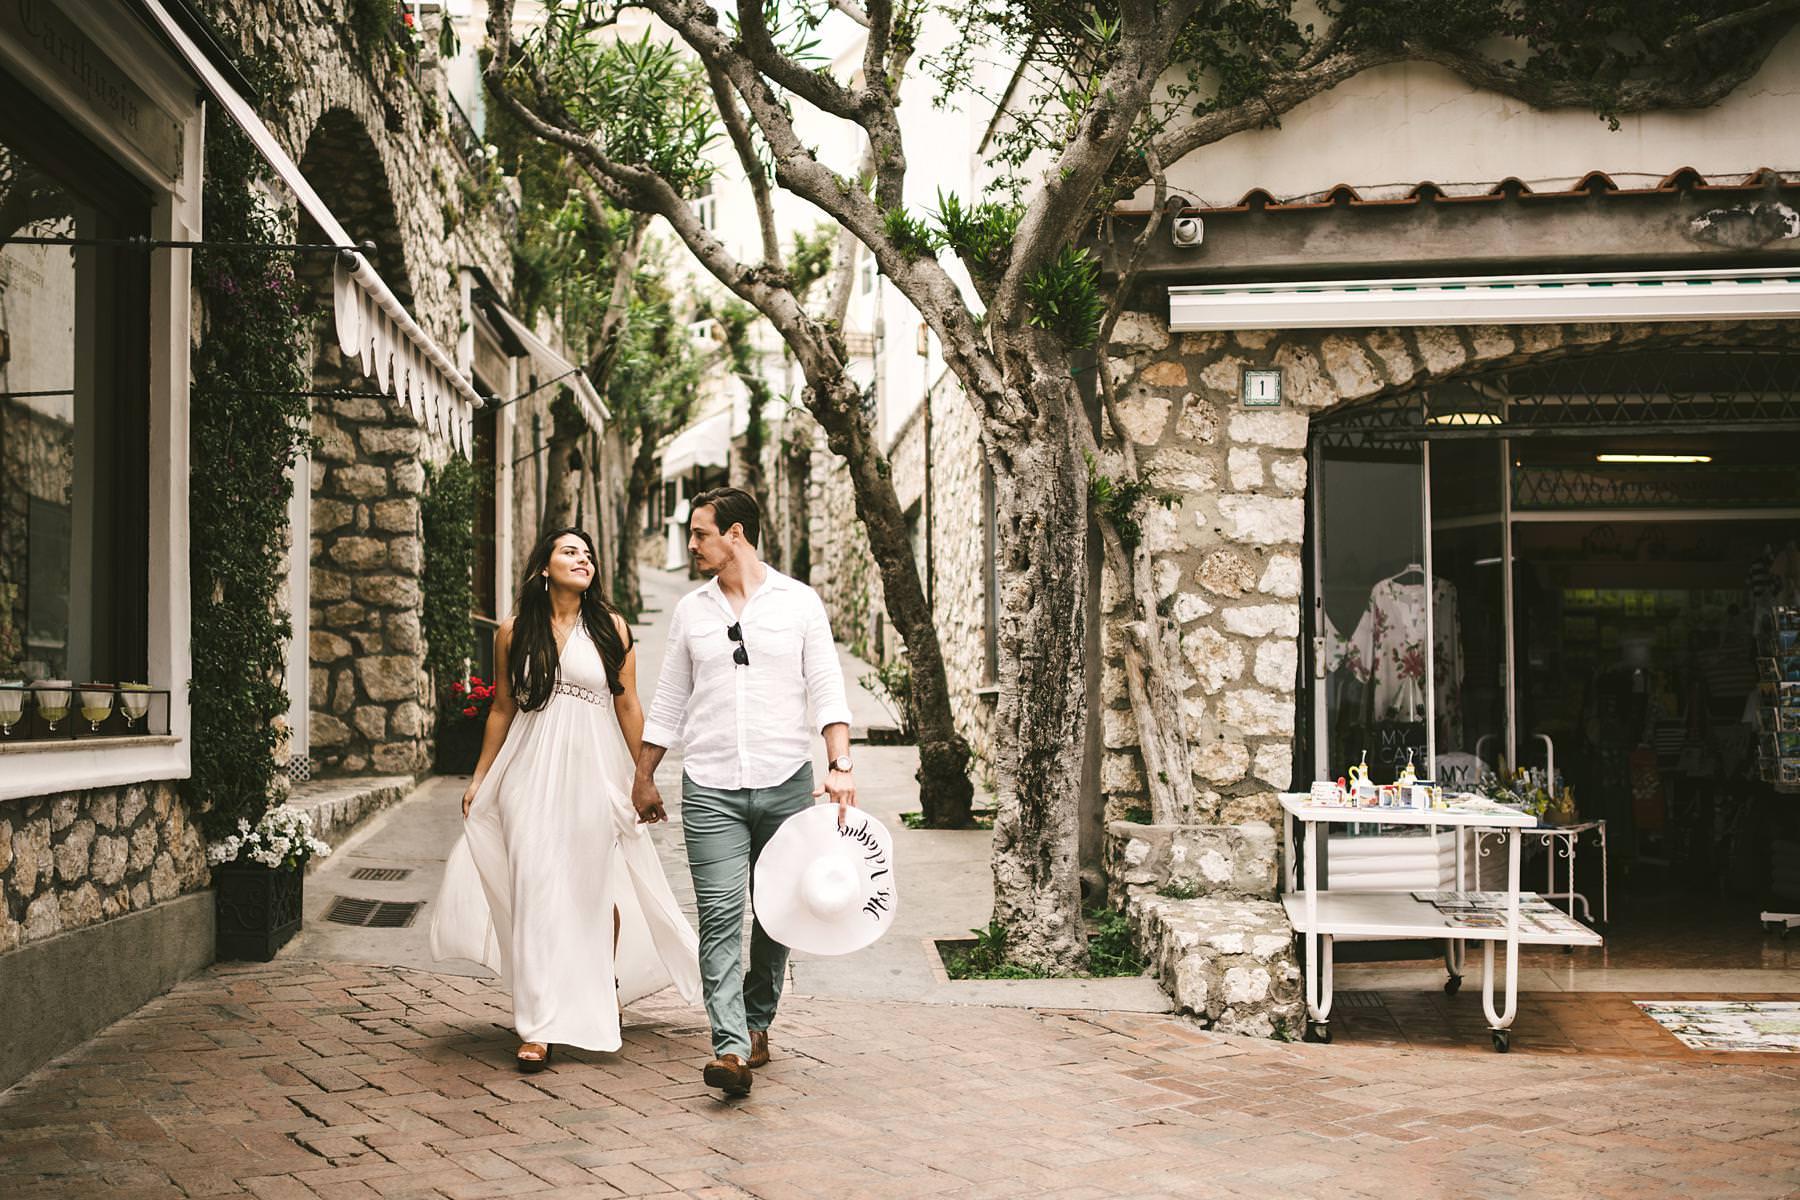 Dreamy and evocative engagement pre-wedding photo shoot in Capri island